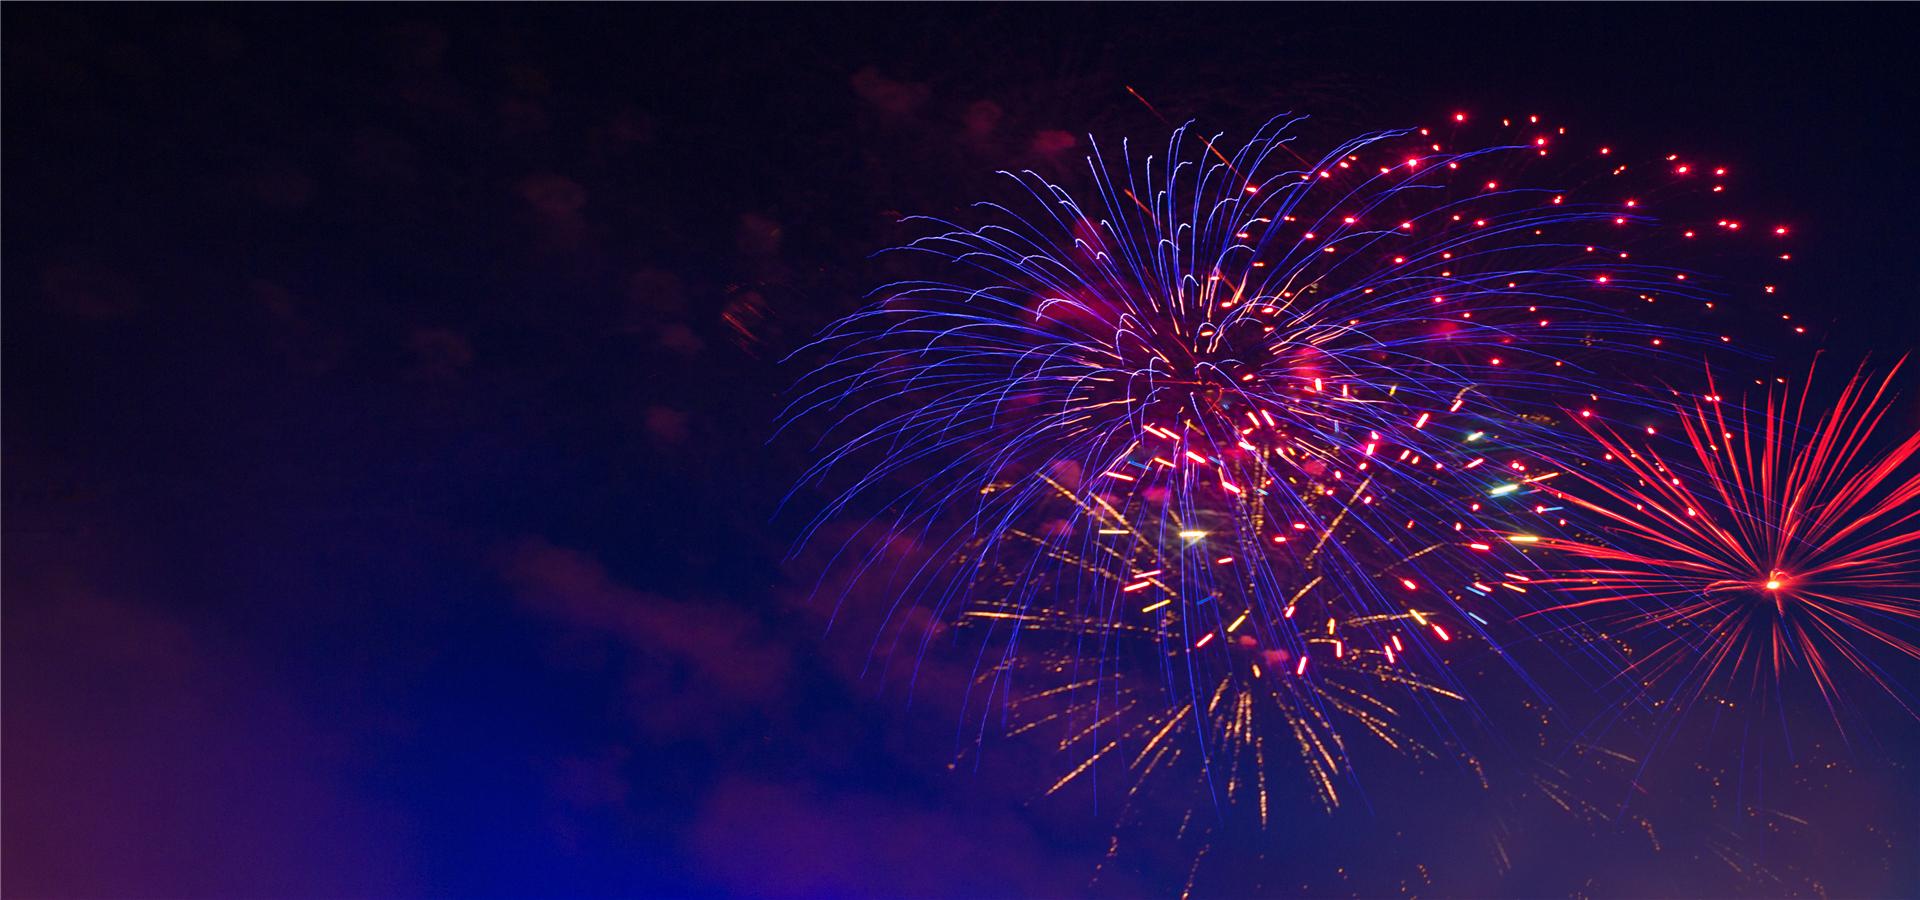 Purple Background Brilliant Fireworks Fireworks Romantic